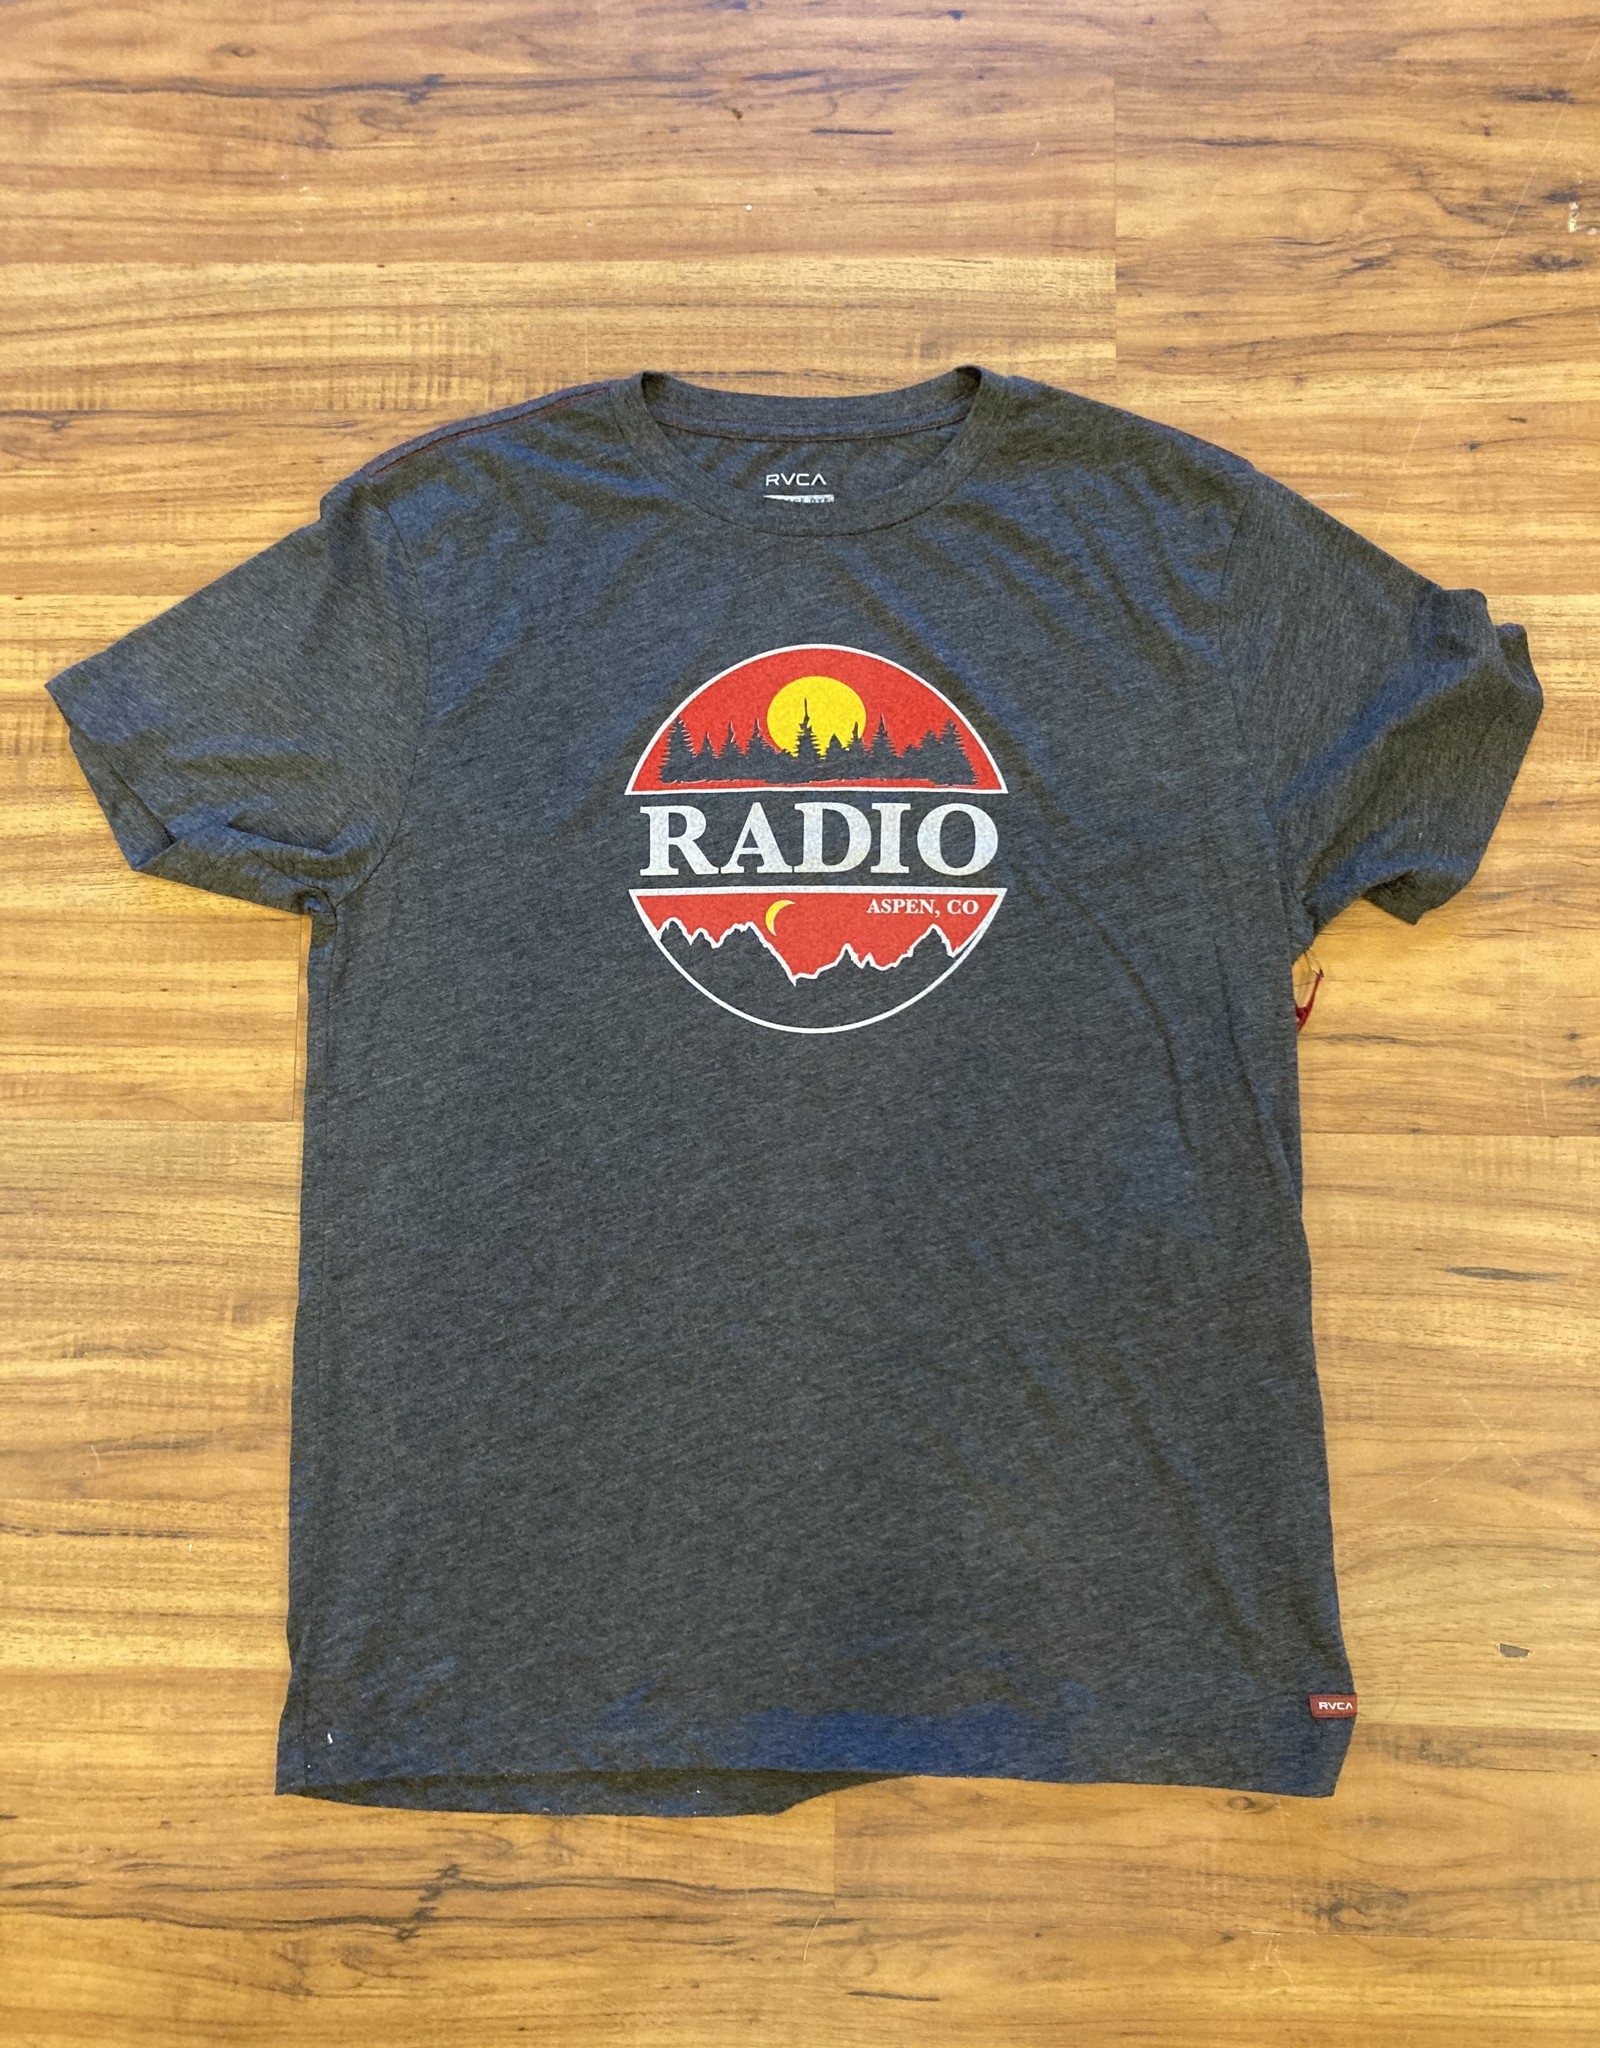 RADIO SUNSET RVCA TEE